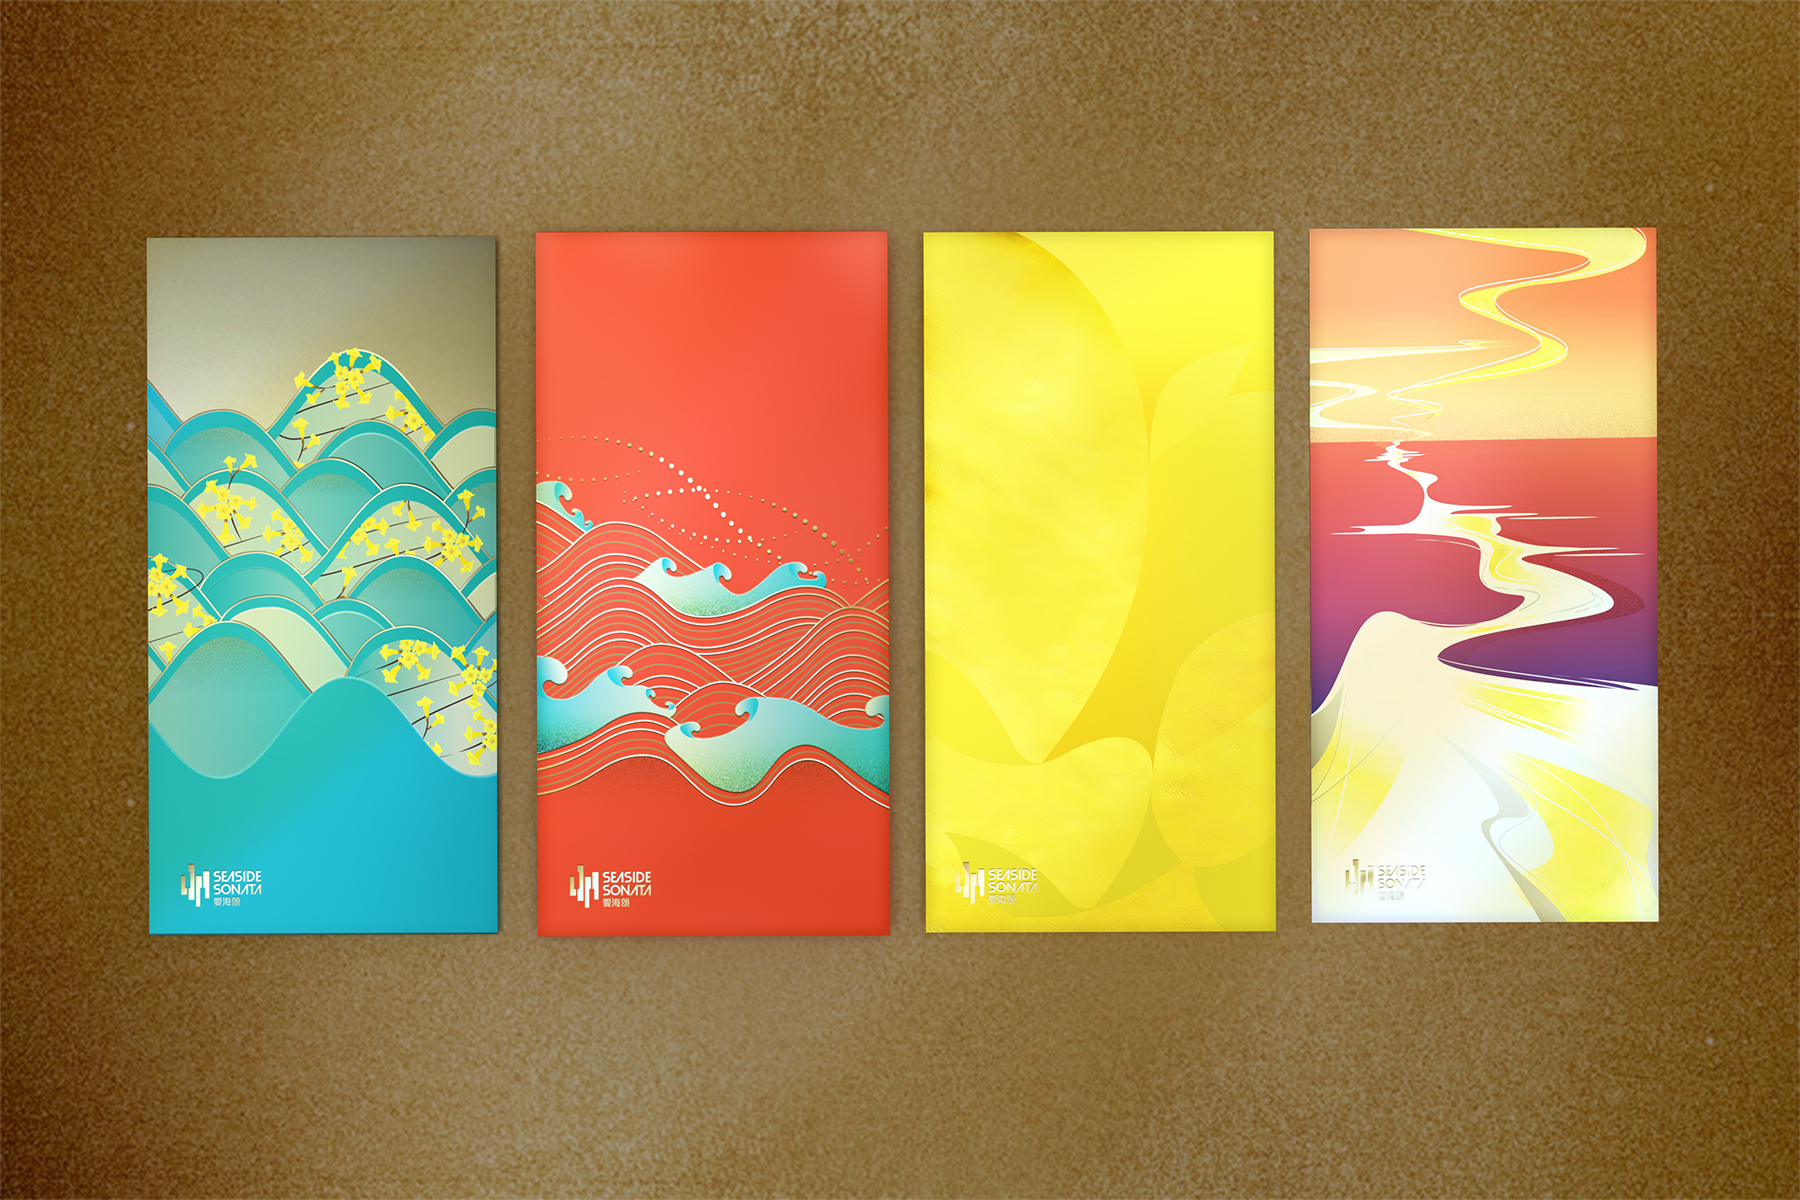 愛海頌利是封設計seaside sonata red pocket design